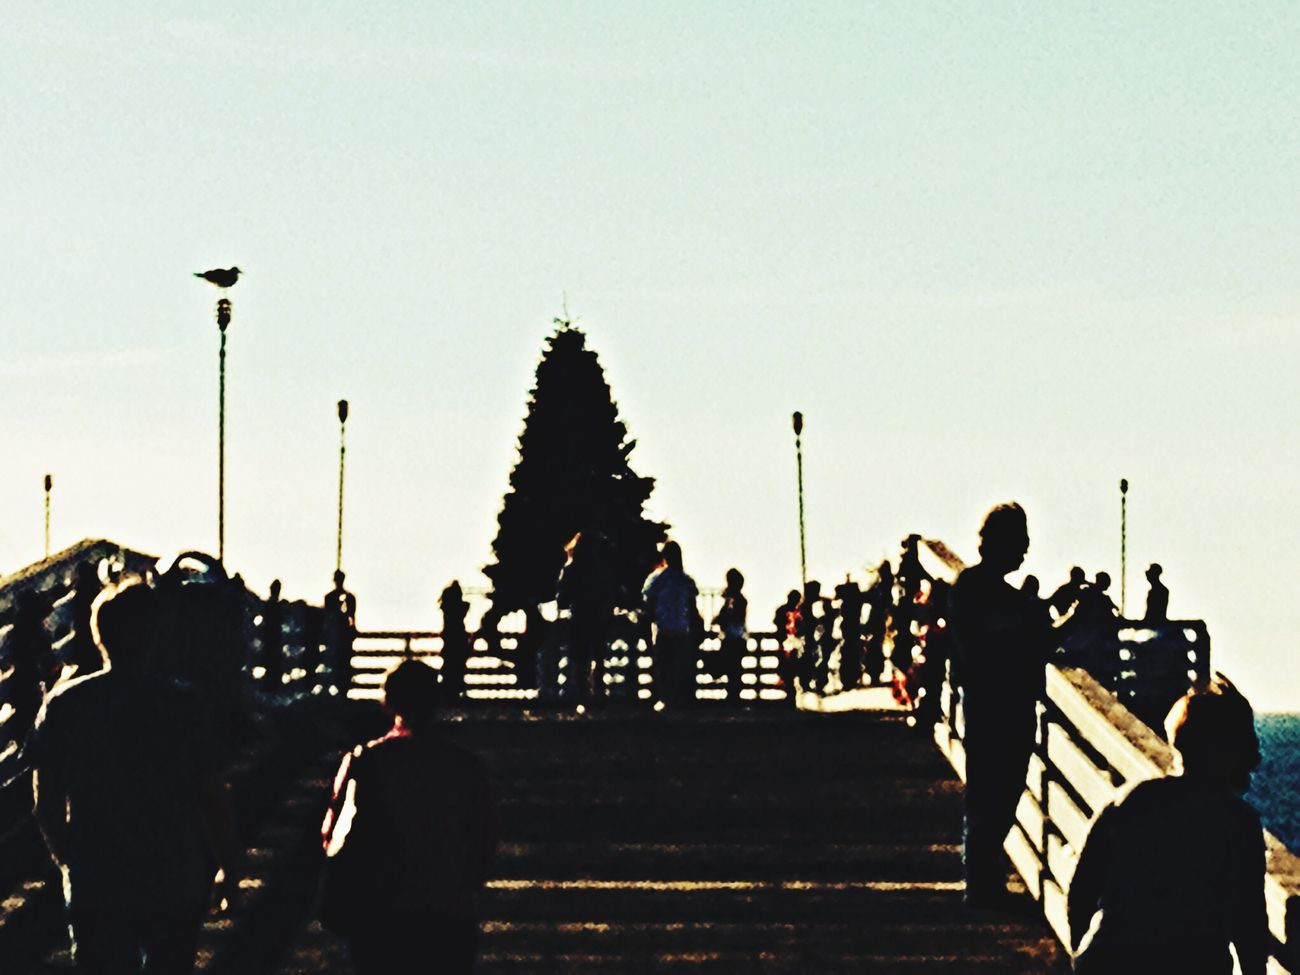 Pier Xmas Tree Boardwalk Walking Around